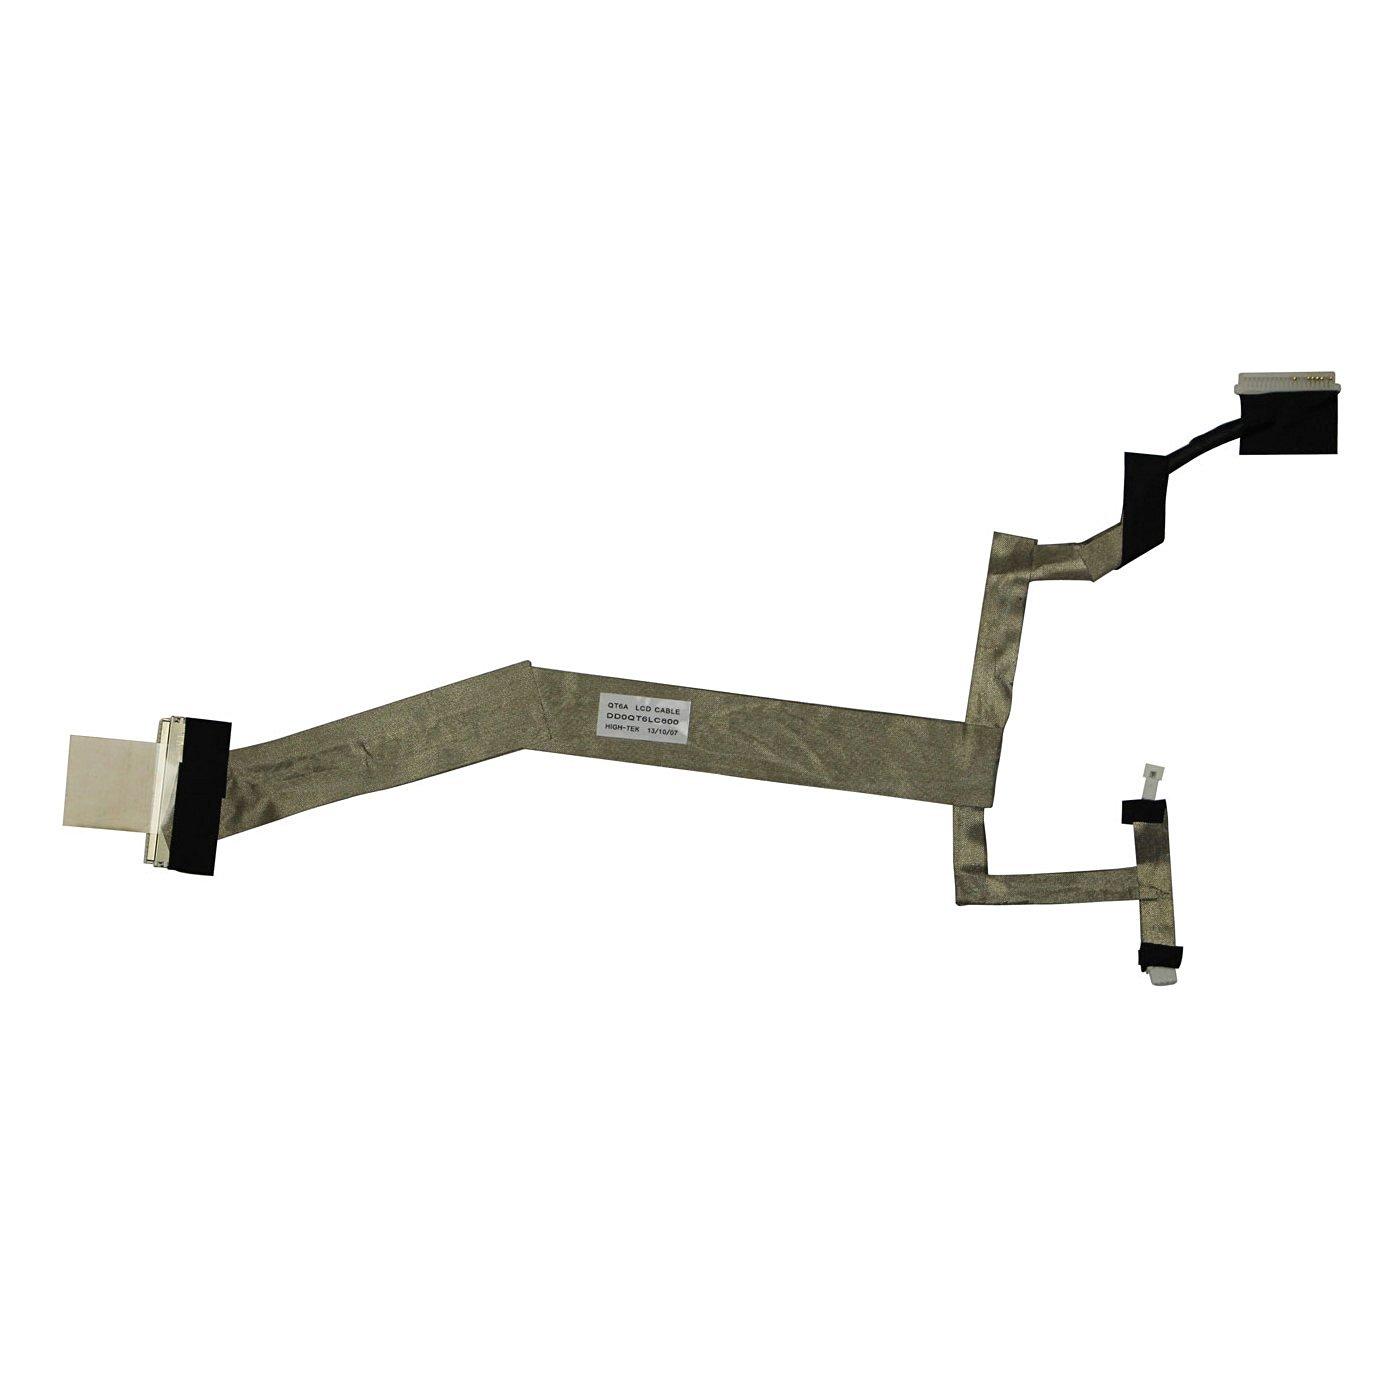 LCD Screen Cable for HP Pavilion dv5-1000 dv5t-1000 CTO dv5z-1000 CTO dv5-1100 dv5t-1100 CTO dv5tse-1100 CTO dv5z-1100 CTO dv5-1200 dv5t-1200se CTO dv5z-1200 CTO dv5-1300 Series Laptop